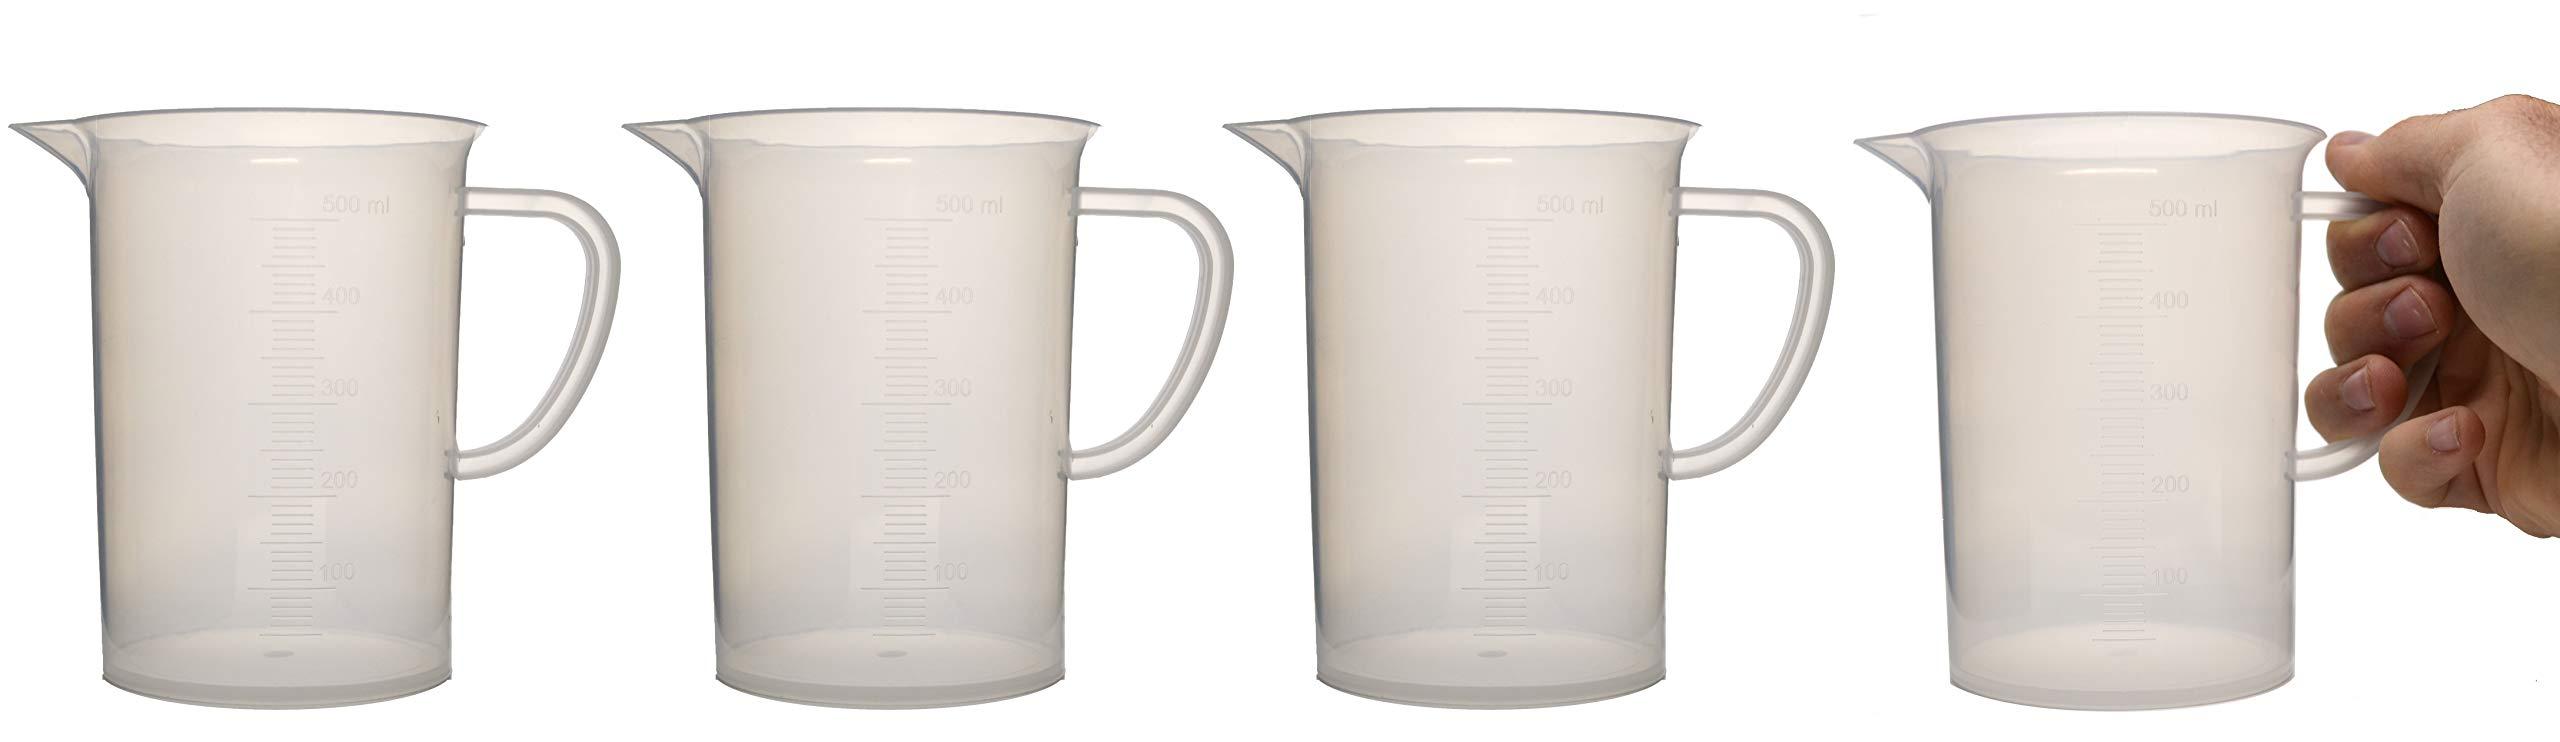 hBAR Premium Polypropylene Beaker Mugs, Laboratory Quality Plastic, 16.9oz (500mL) Capacity - Pack of 4 Mugs - Dishwasher and Microwave Safe by hBARSCI